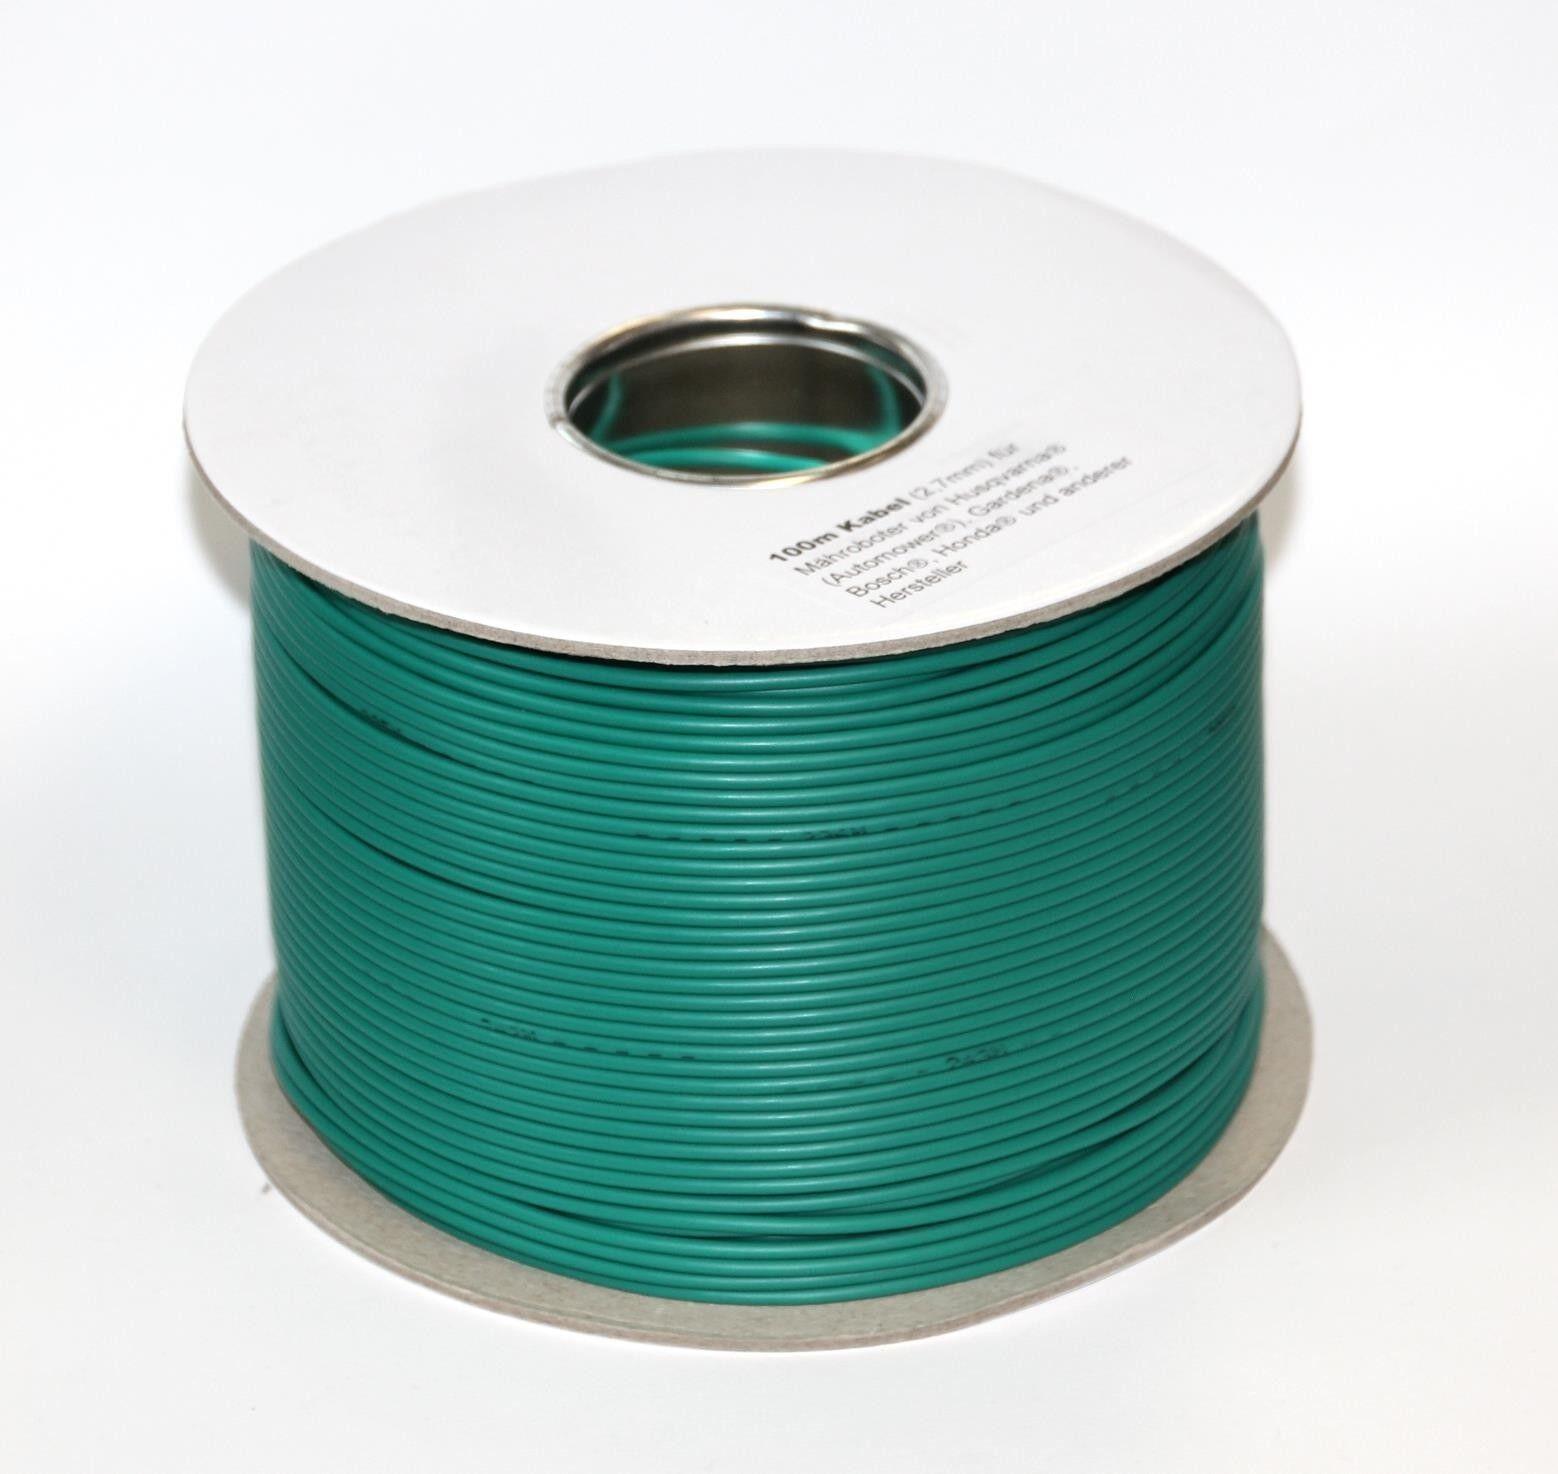 genisys limitaci/ón Cable Cable 25/m Gardena r80li r100li r130li limitadora alambre /ø2,7/mm